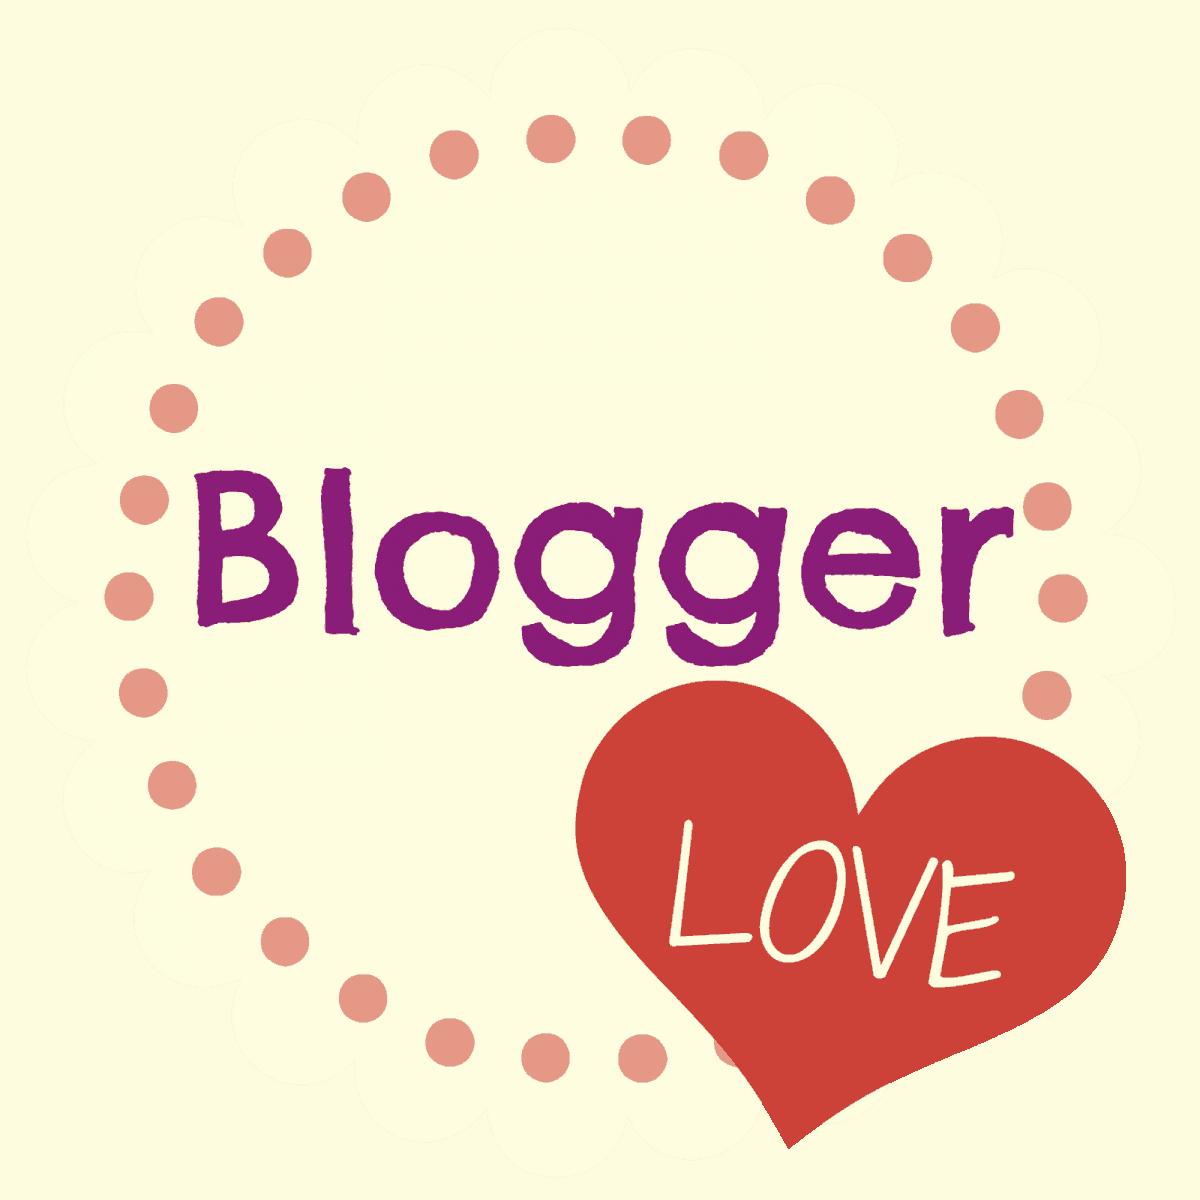 Sharing A Little Blogger Love